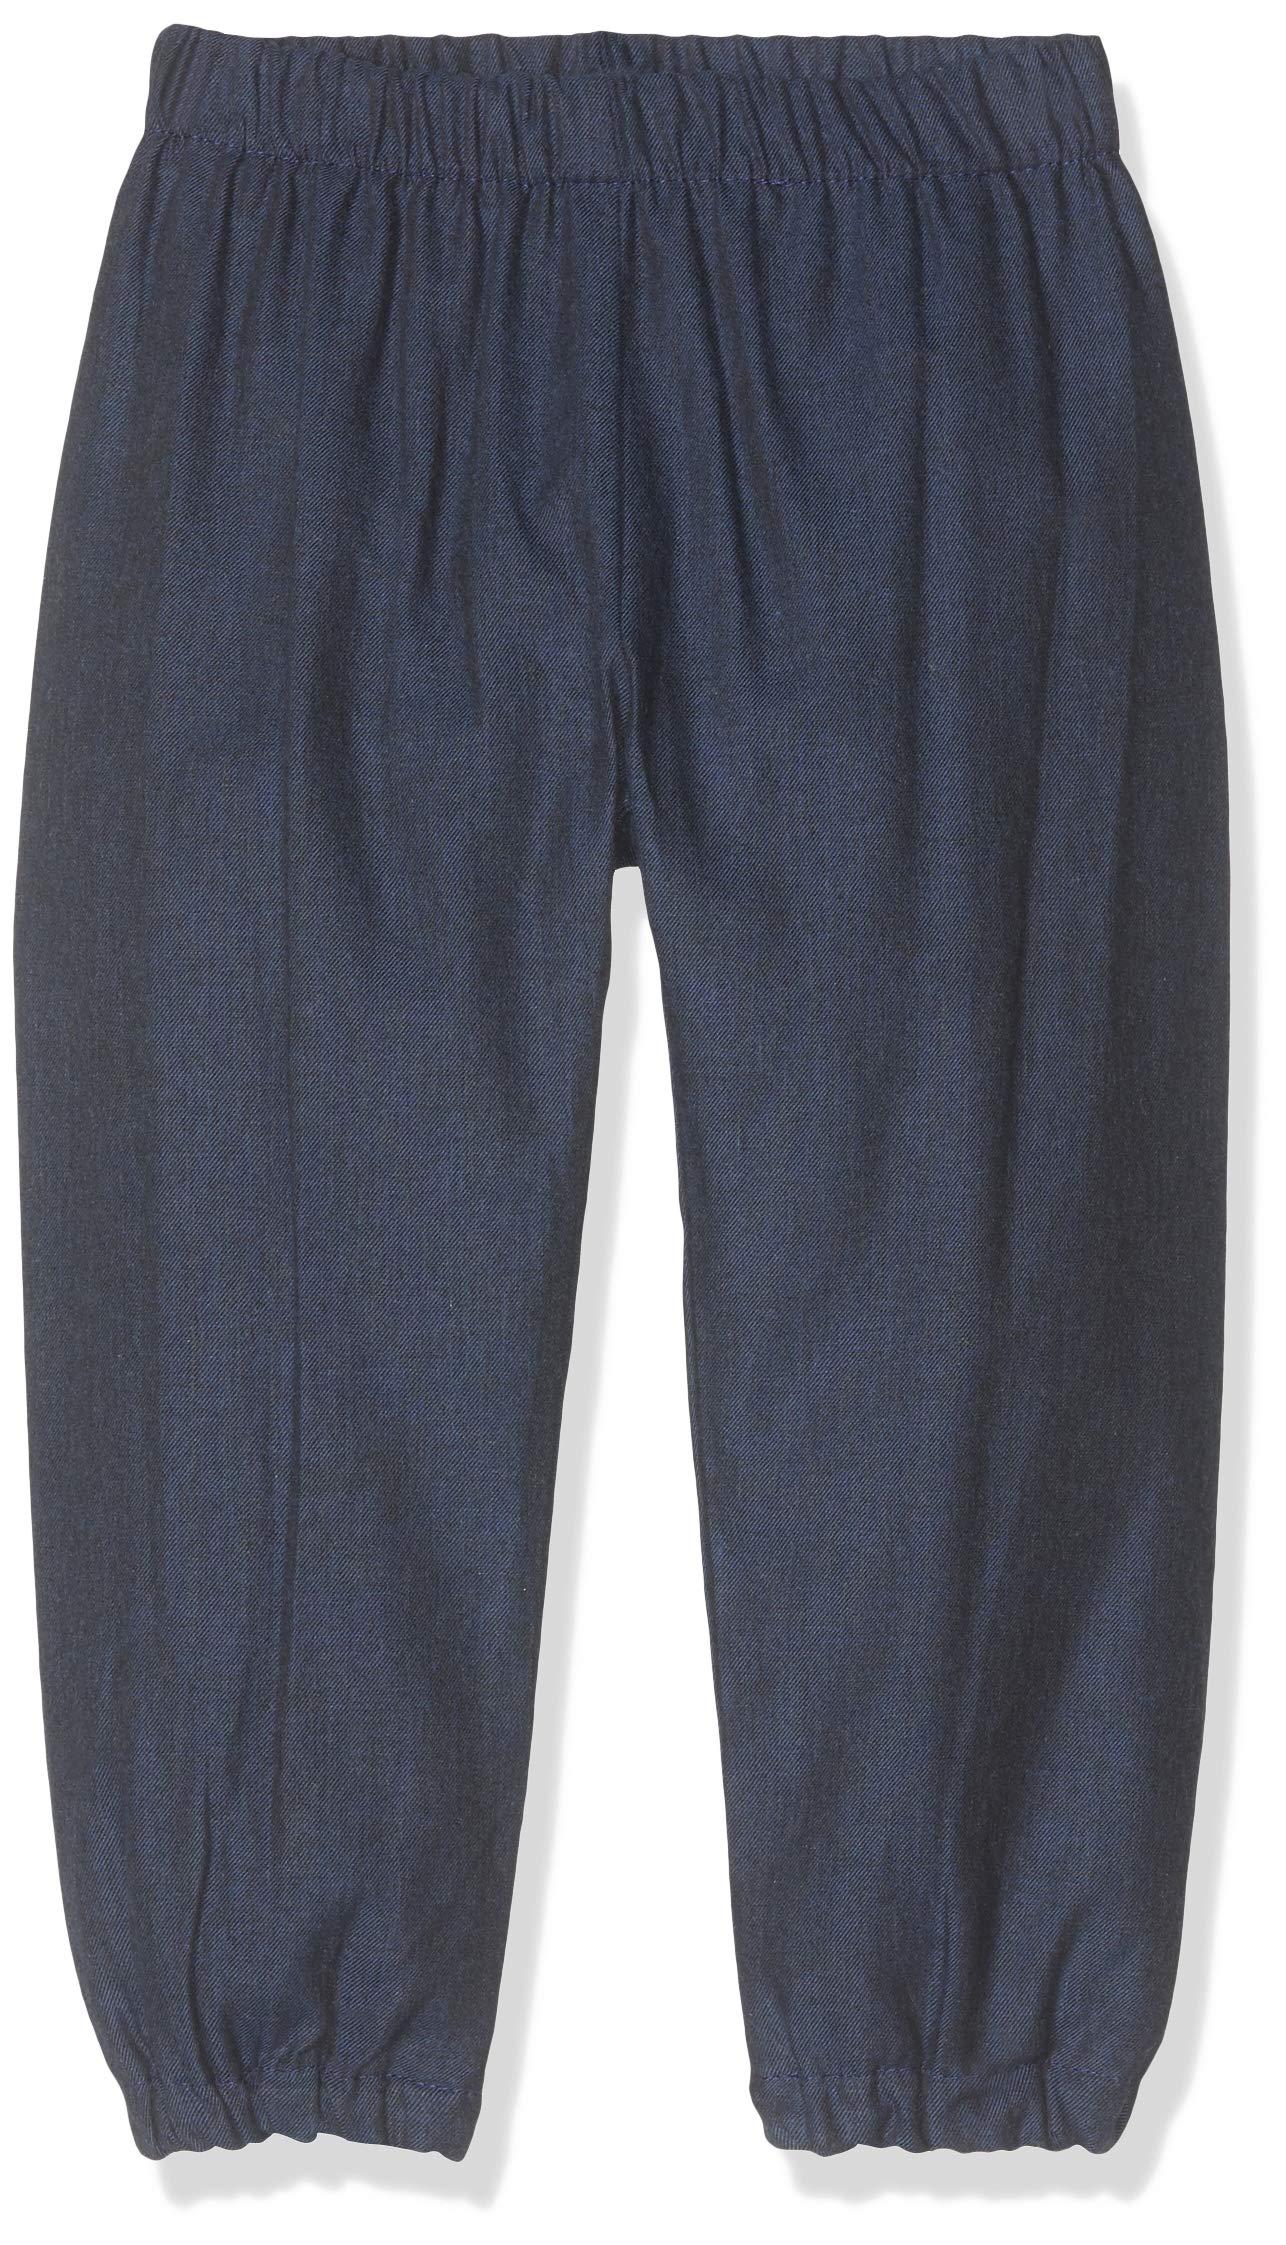 Chicco Pantaloni Lunghi Pantalones para Bebés 5